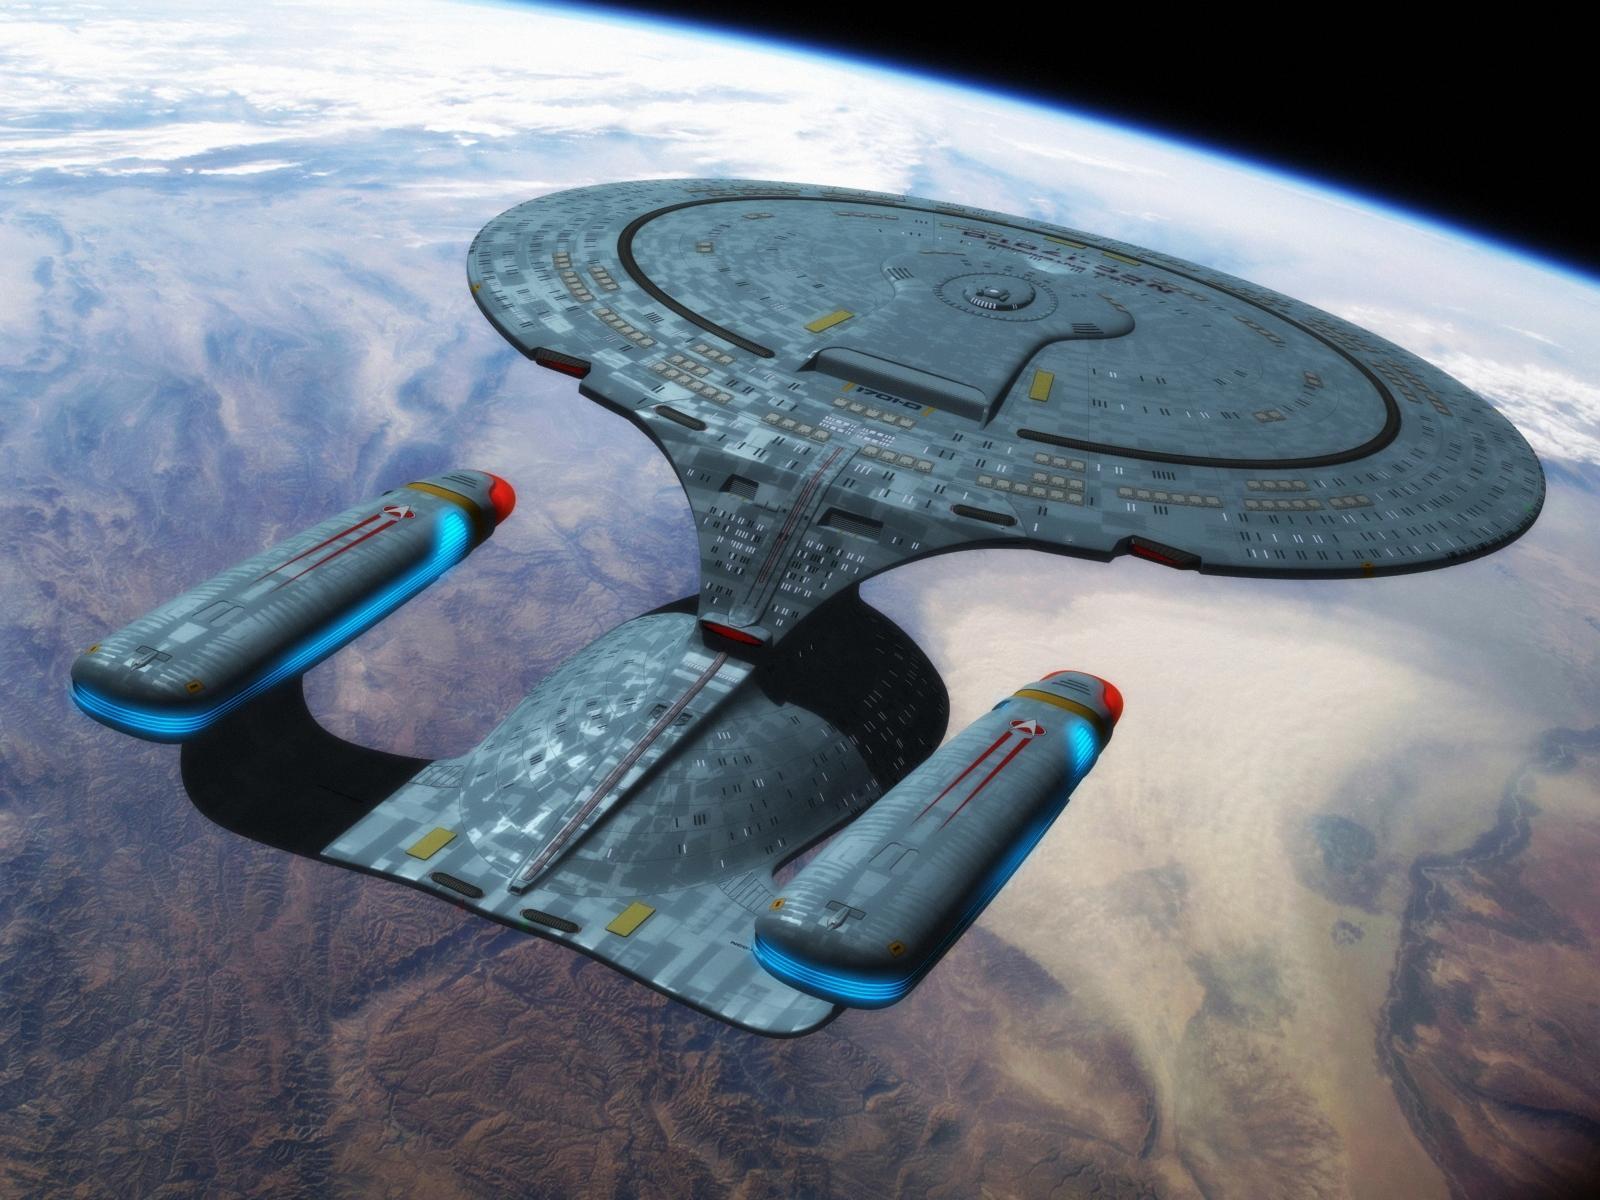 best of star trek enterprise animated gifs best animations - HD1600×1200